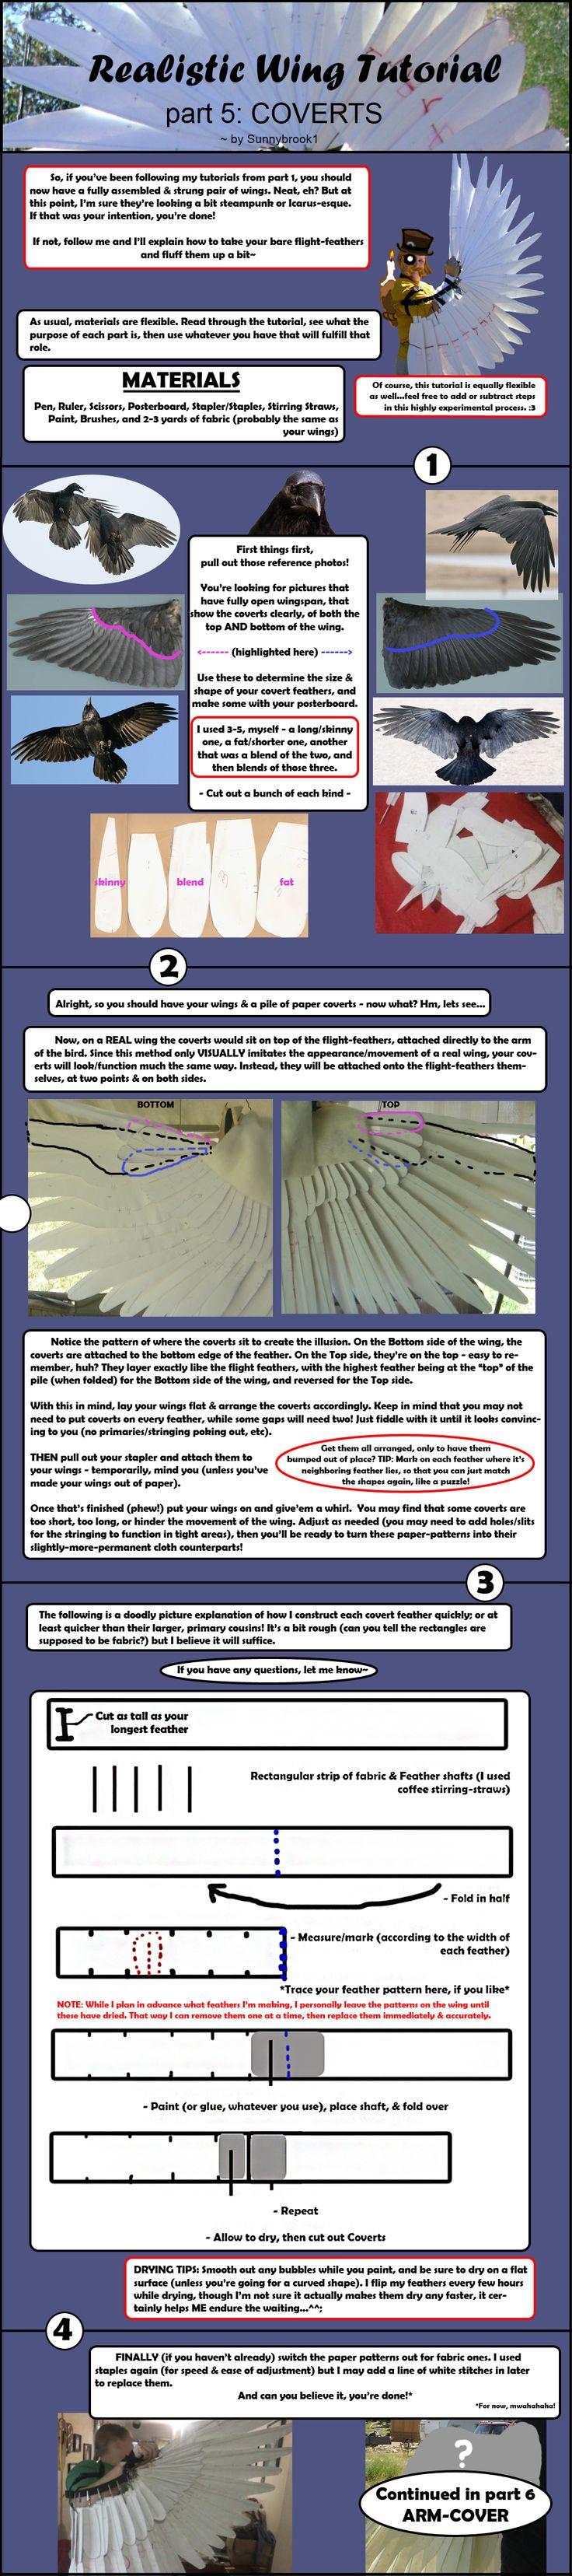 Realistic Wing Tutorial - P.5 by Sunnybrook1.deviantart.com on @deviantART